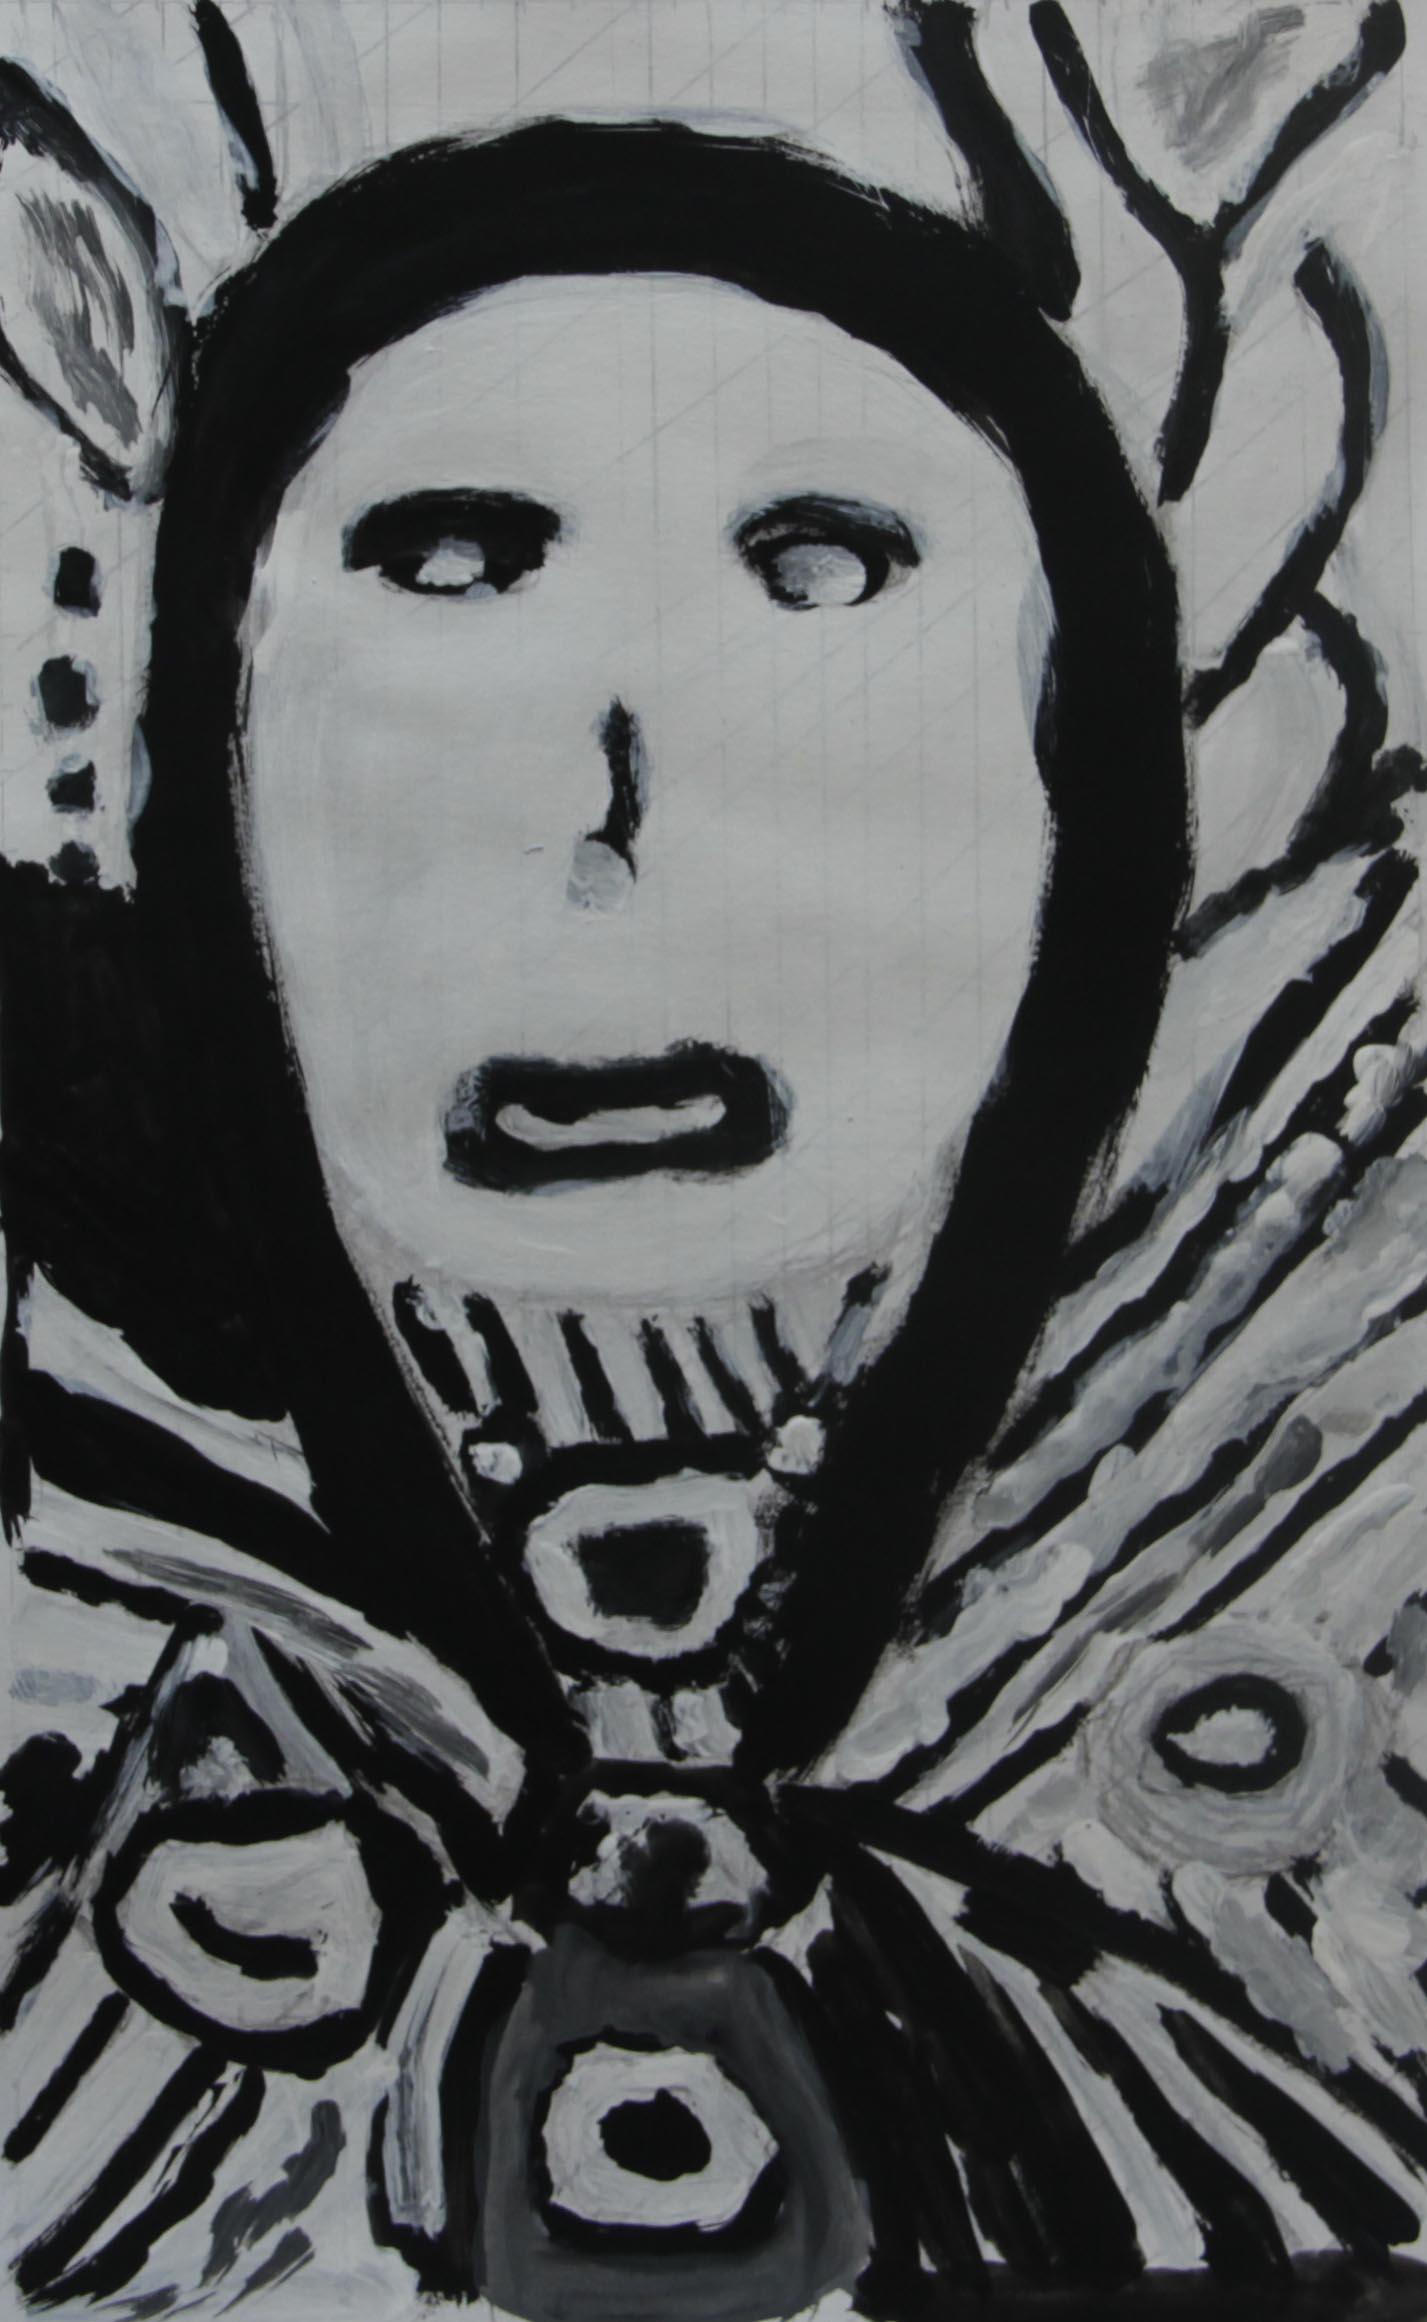 Joakim Terzo, 33x20